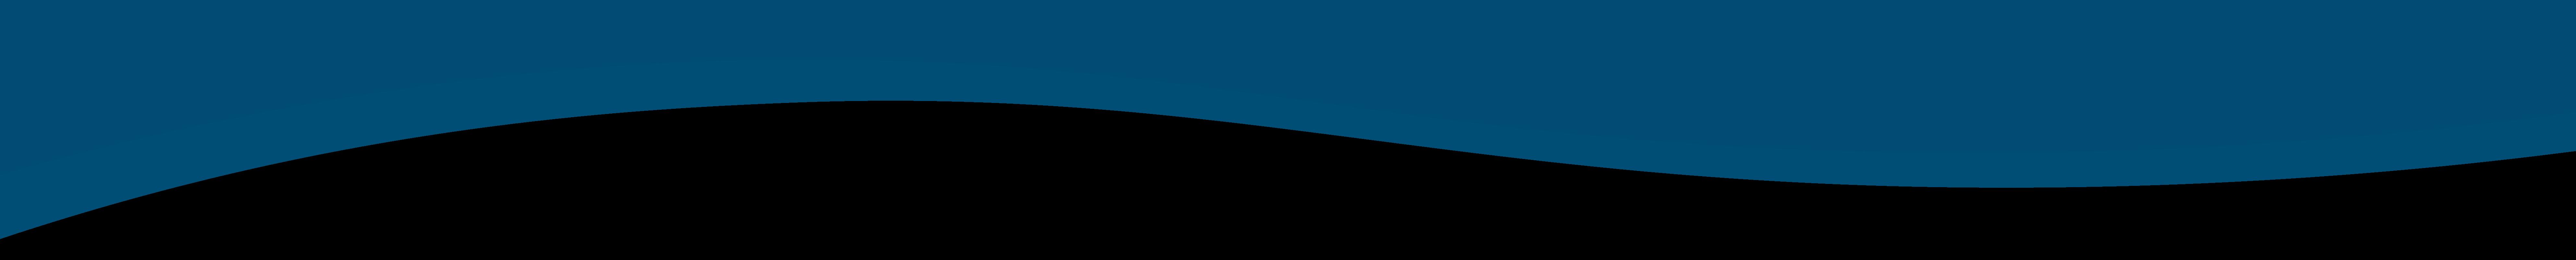 Navy blue wave (2)-2